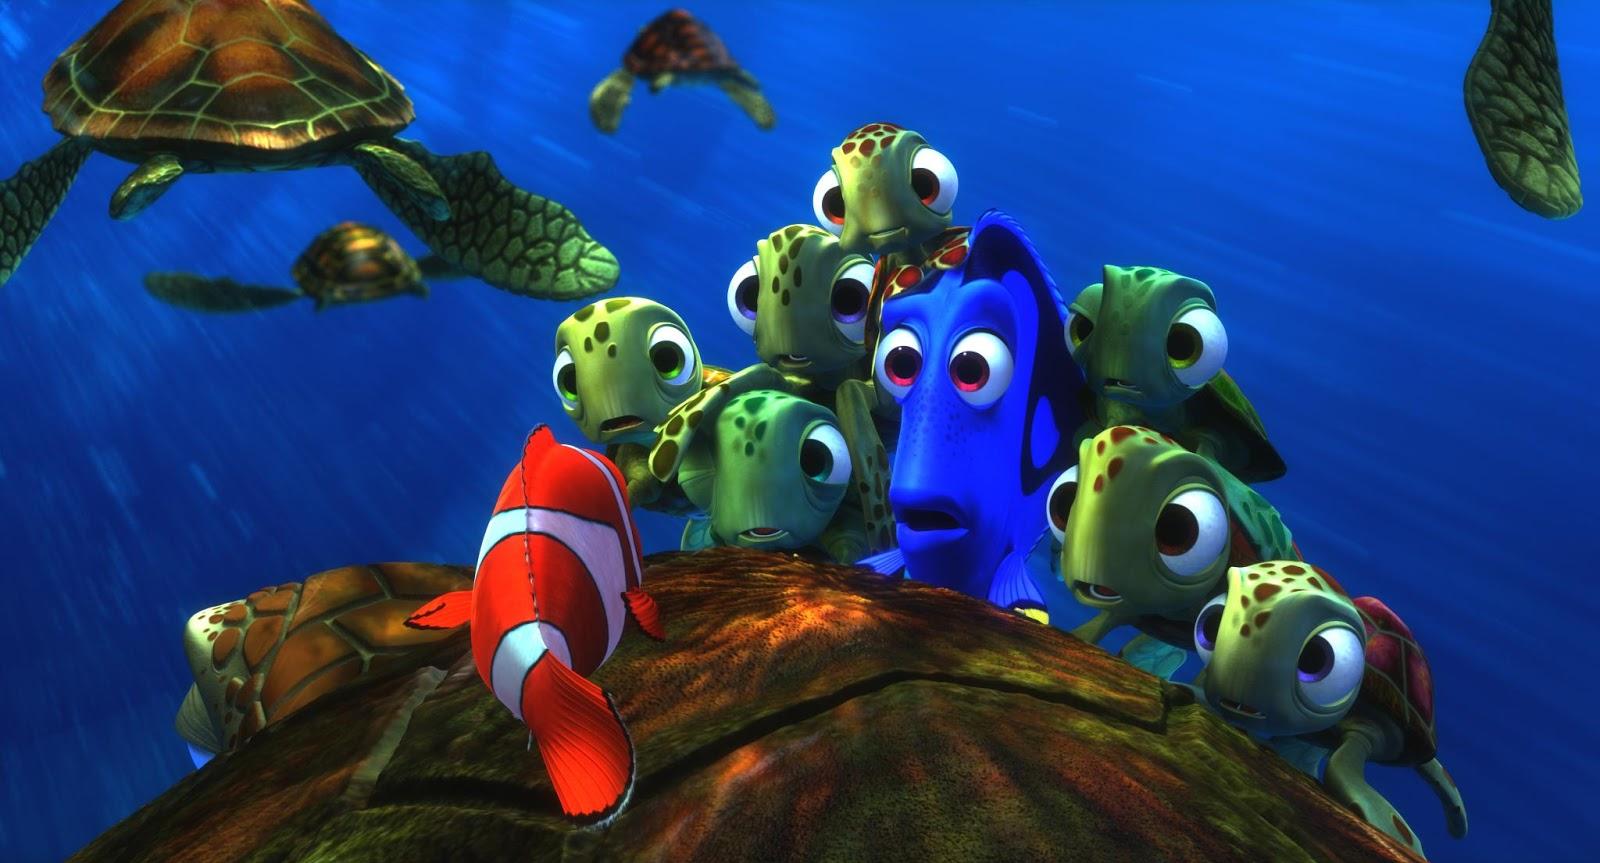 My favourite pixar movie finding nemo 2003 for Finding nemo fish